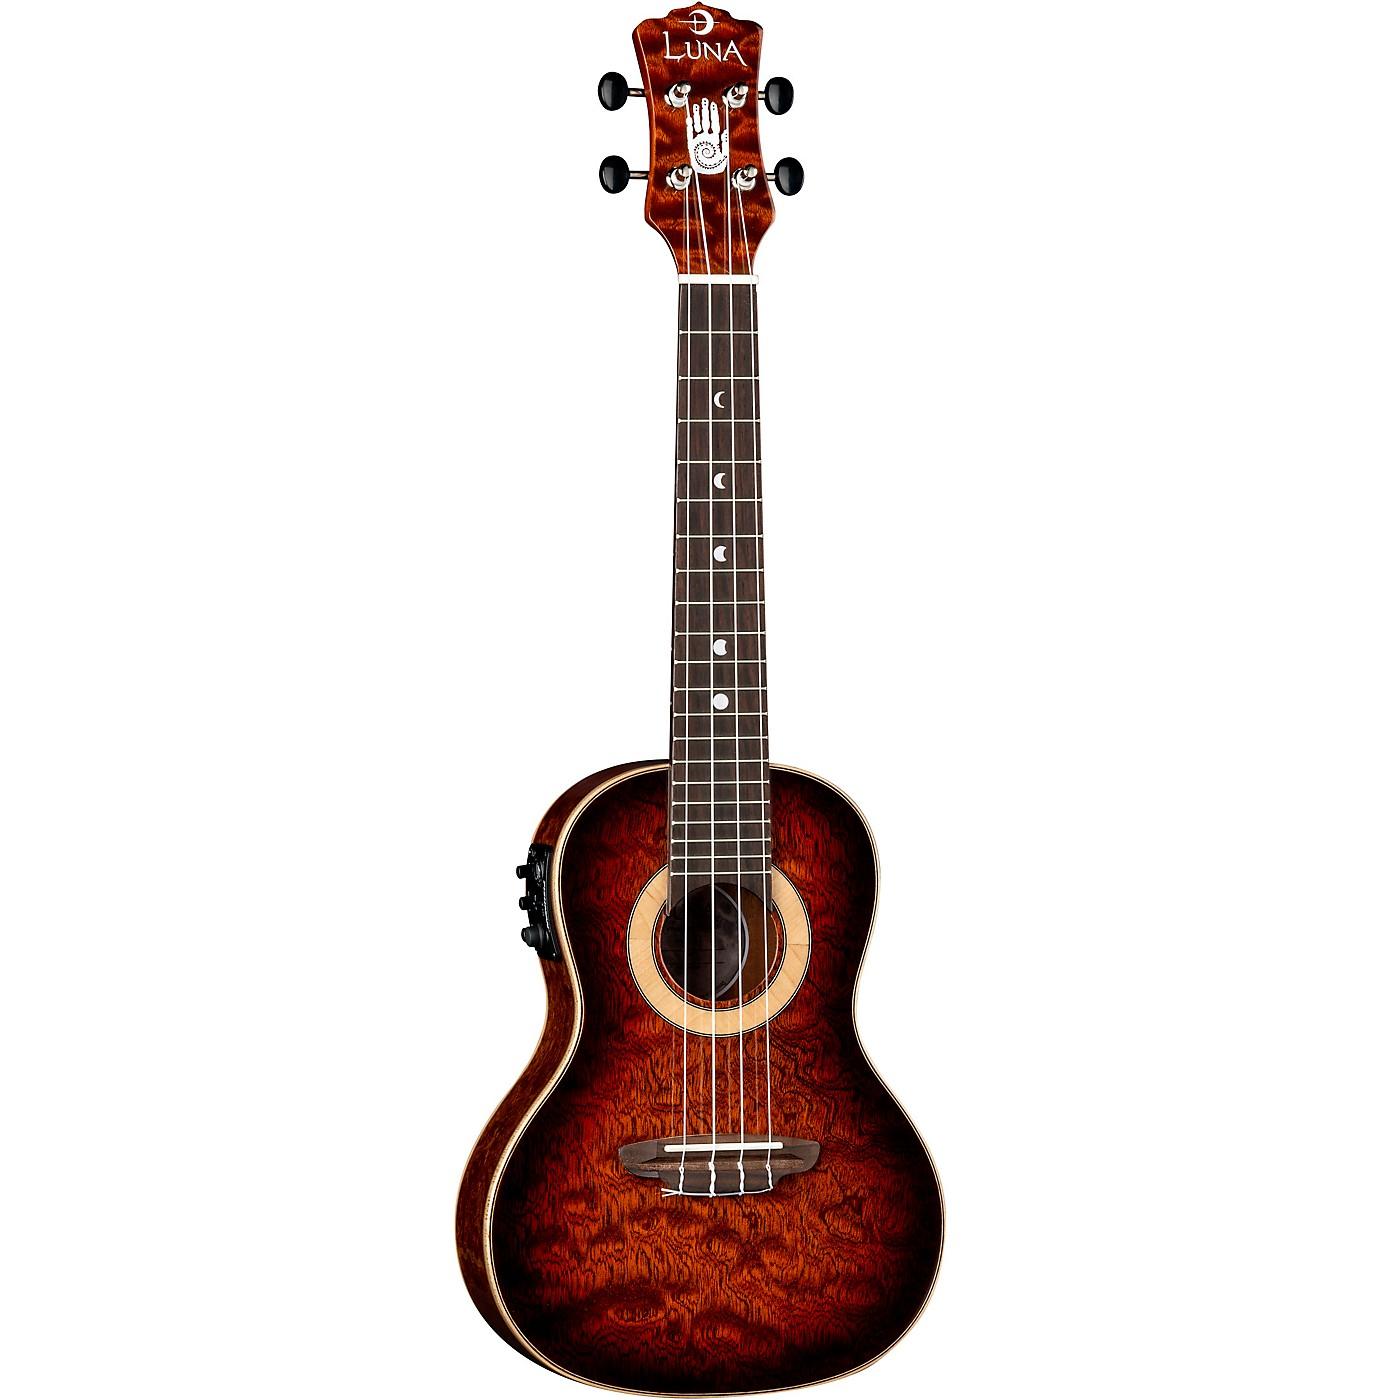 Luna Guitars 15th Anniversary Koa Concert Acoustic-Electric Ukulele thumbnail